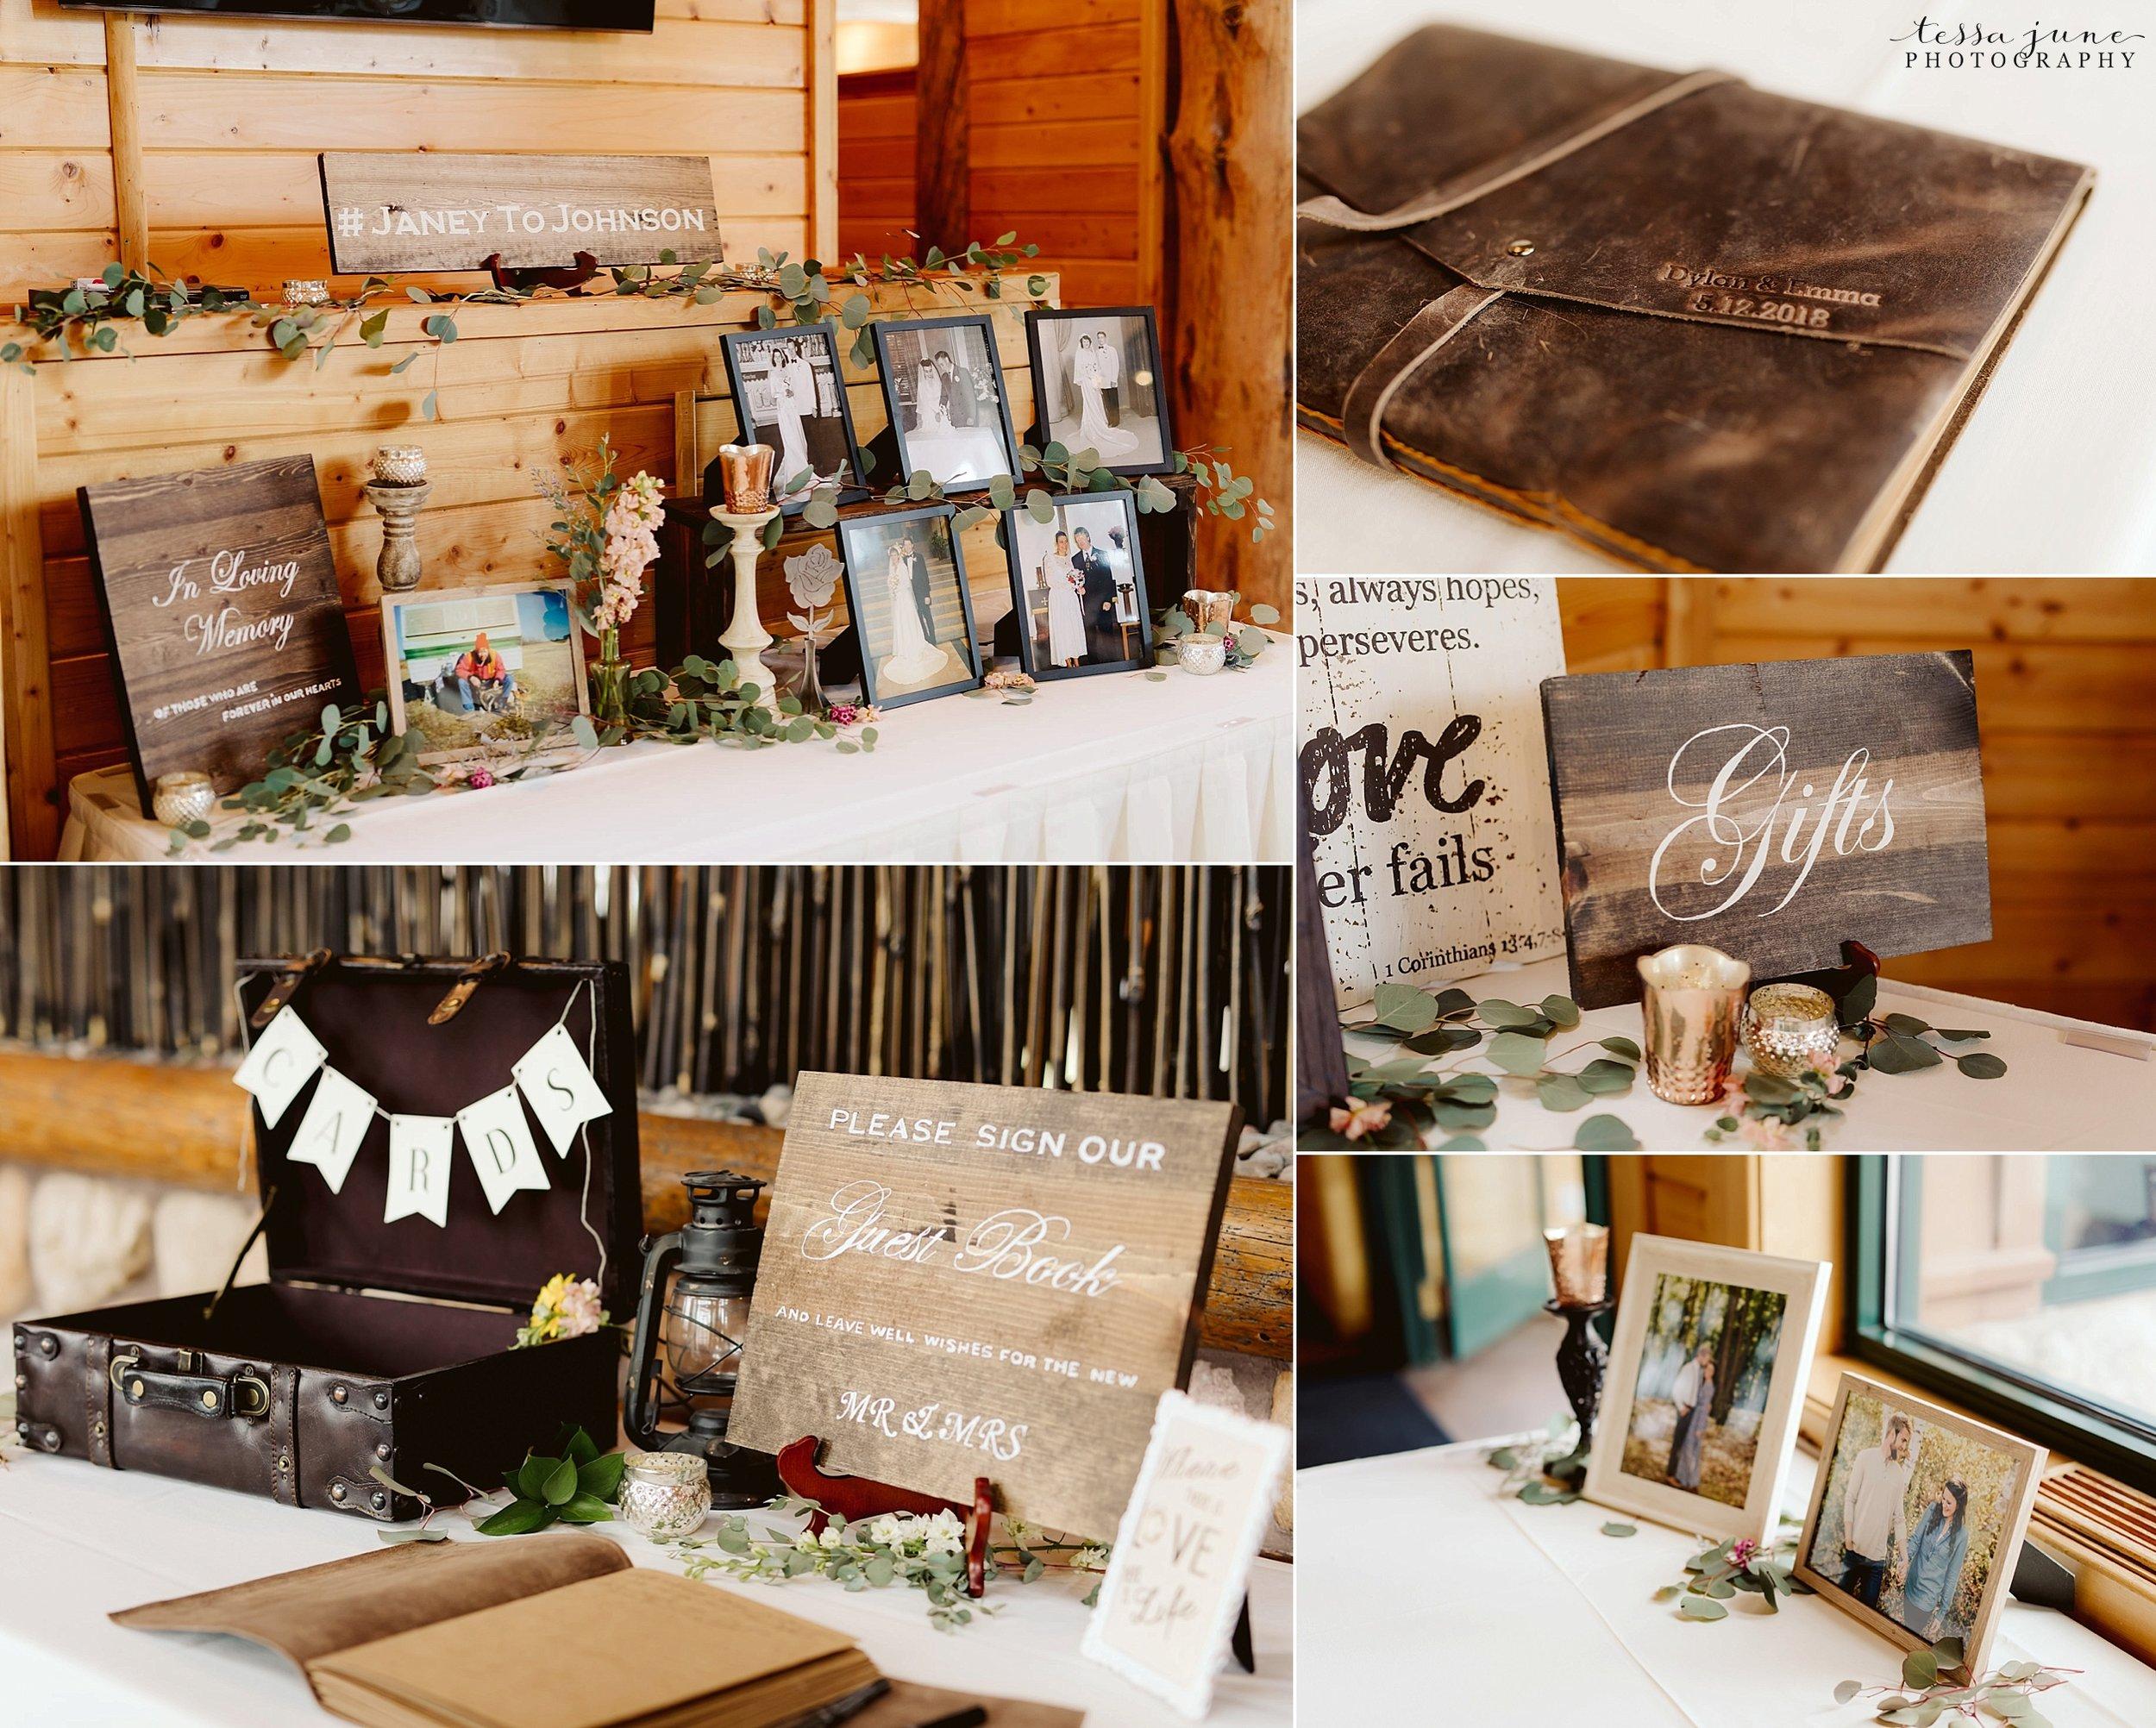 The-grands-at-mulligans-wedding-sartell-minnesota-spring-floral-spring-garden-wedding-6.jpg